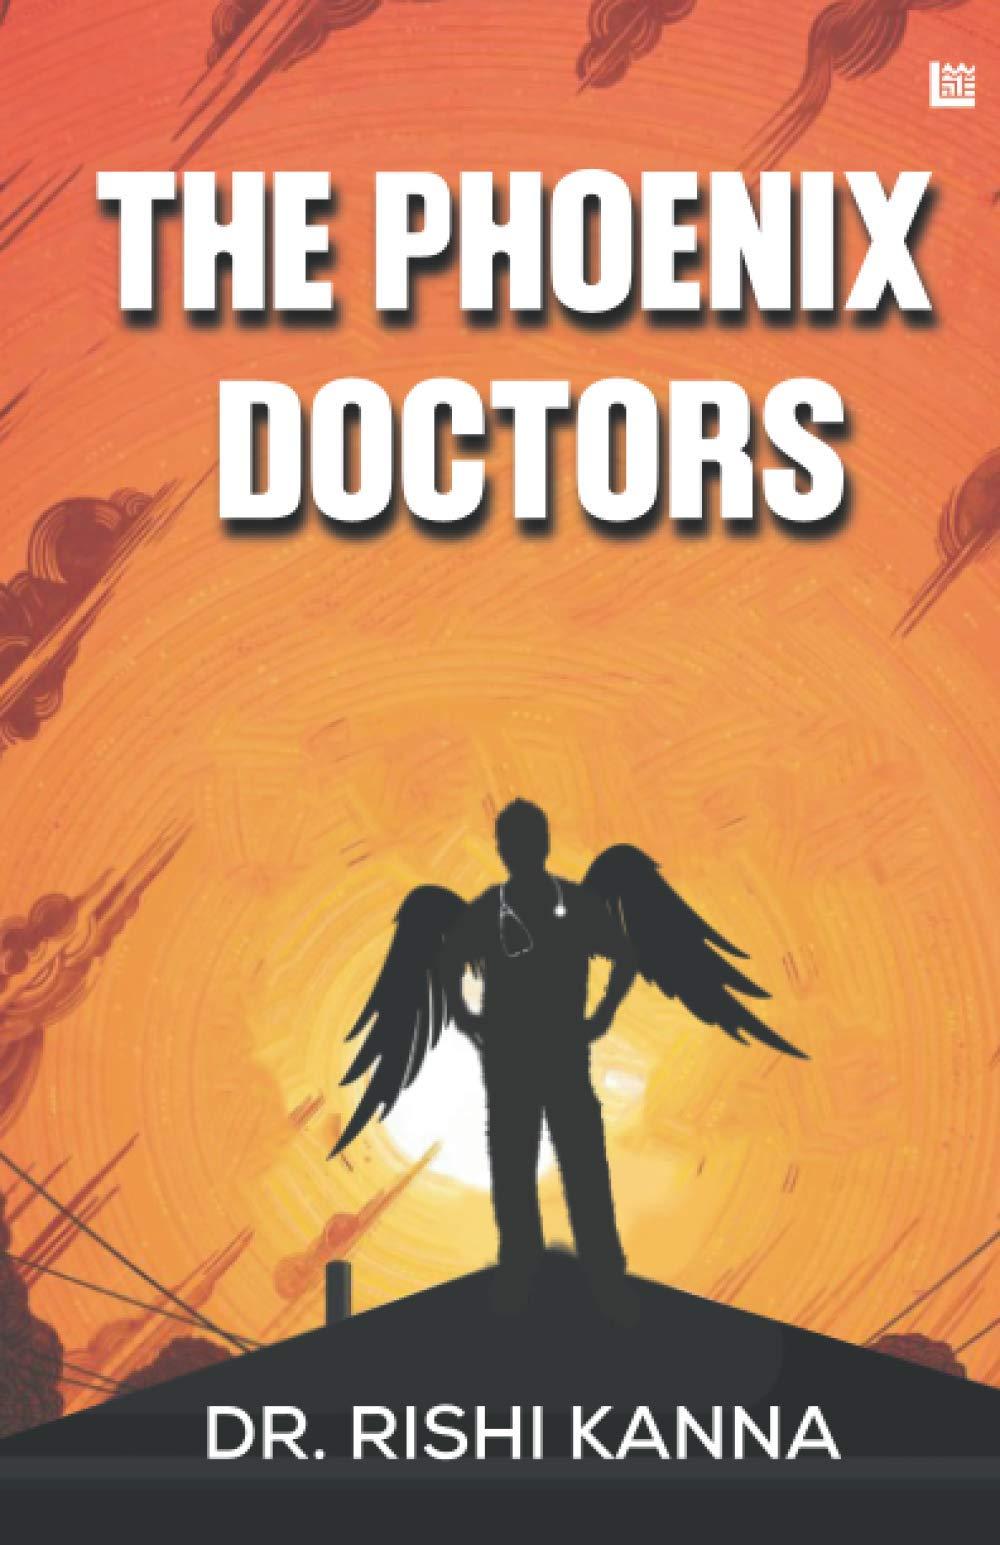 The Phoenix Doctors by Dr Rishi Kanna